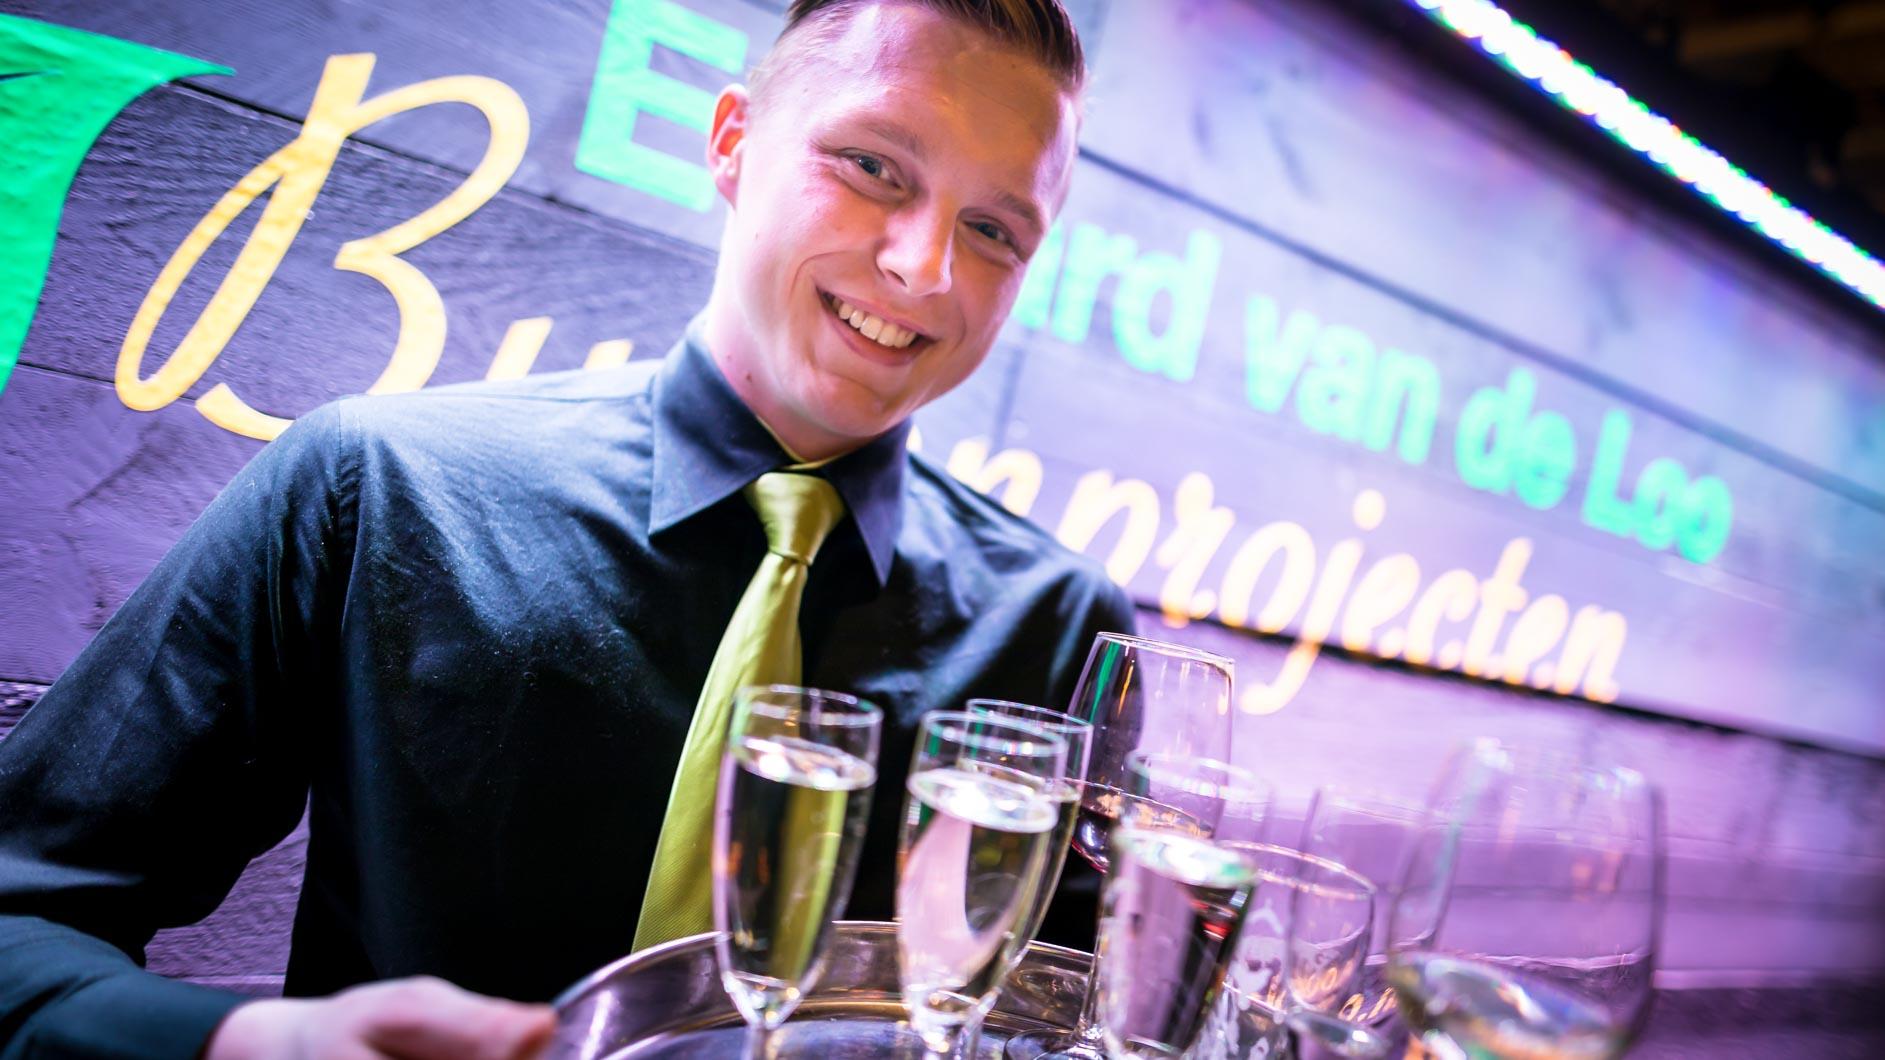 evenementen-fotografie-eindhoven-marketing-lynx-ektor-tsolodimos-6